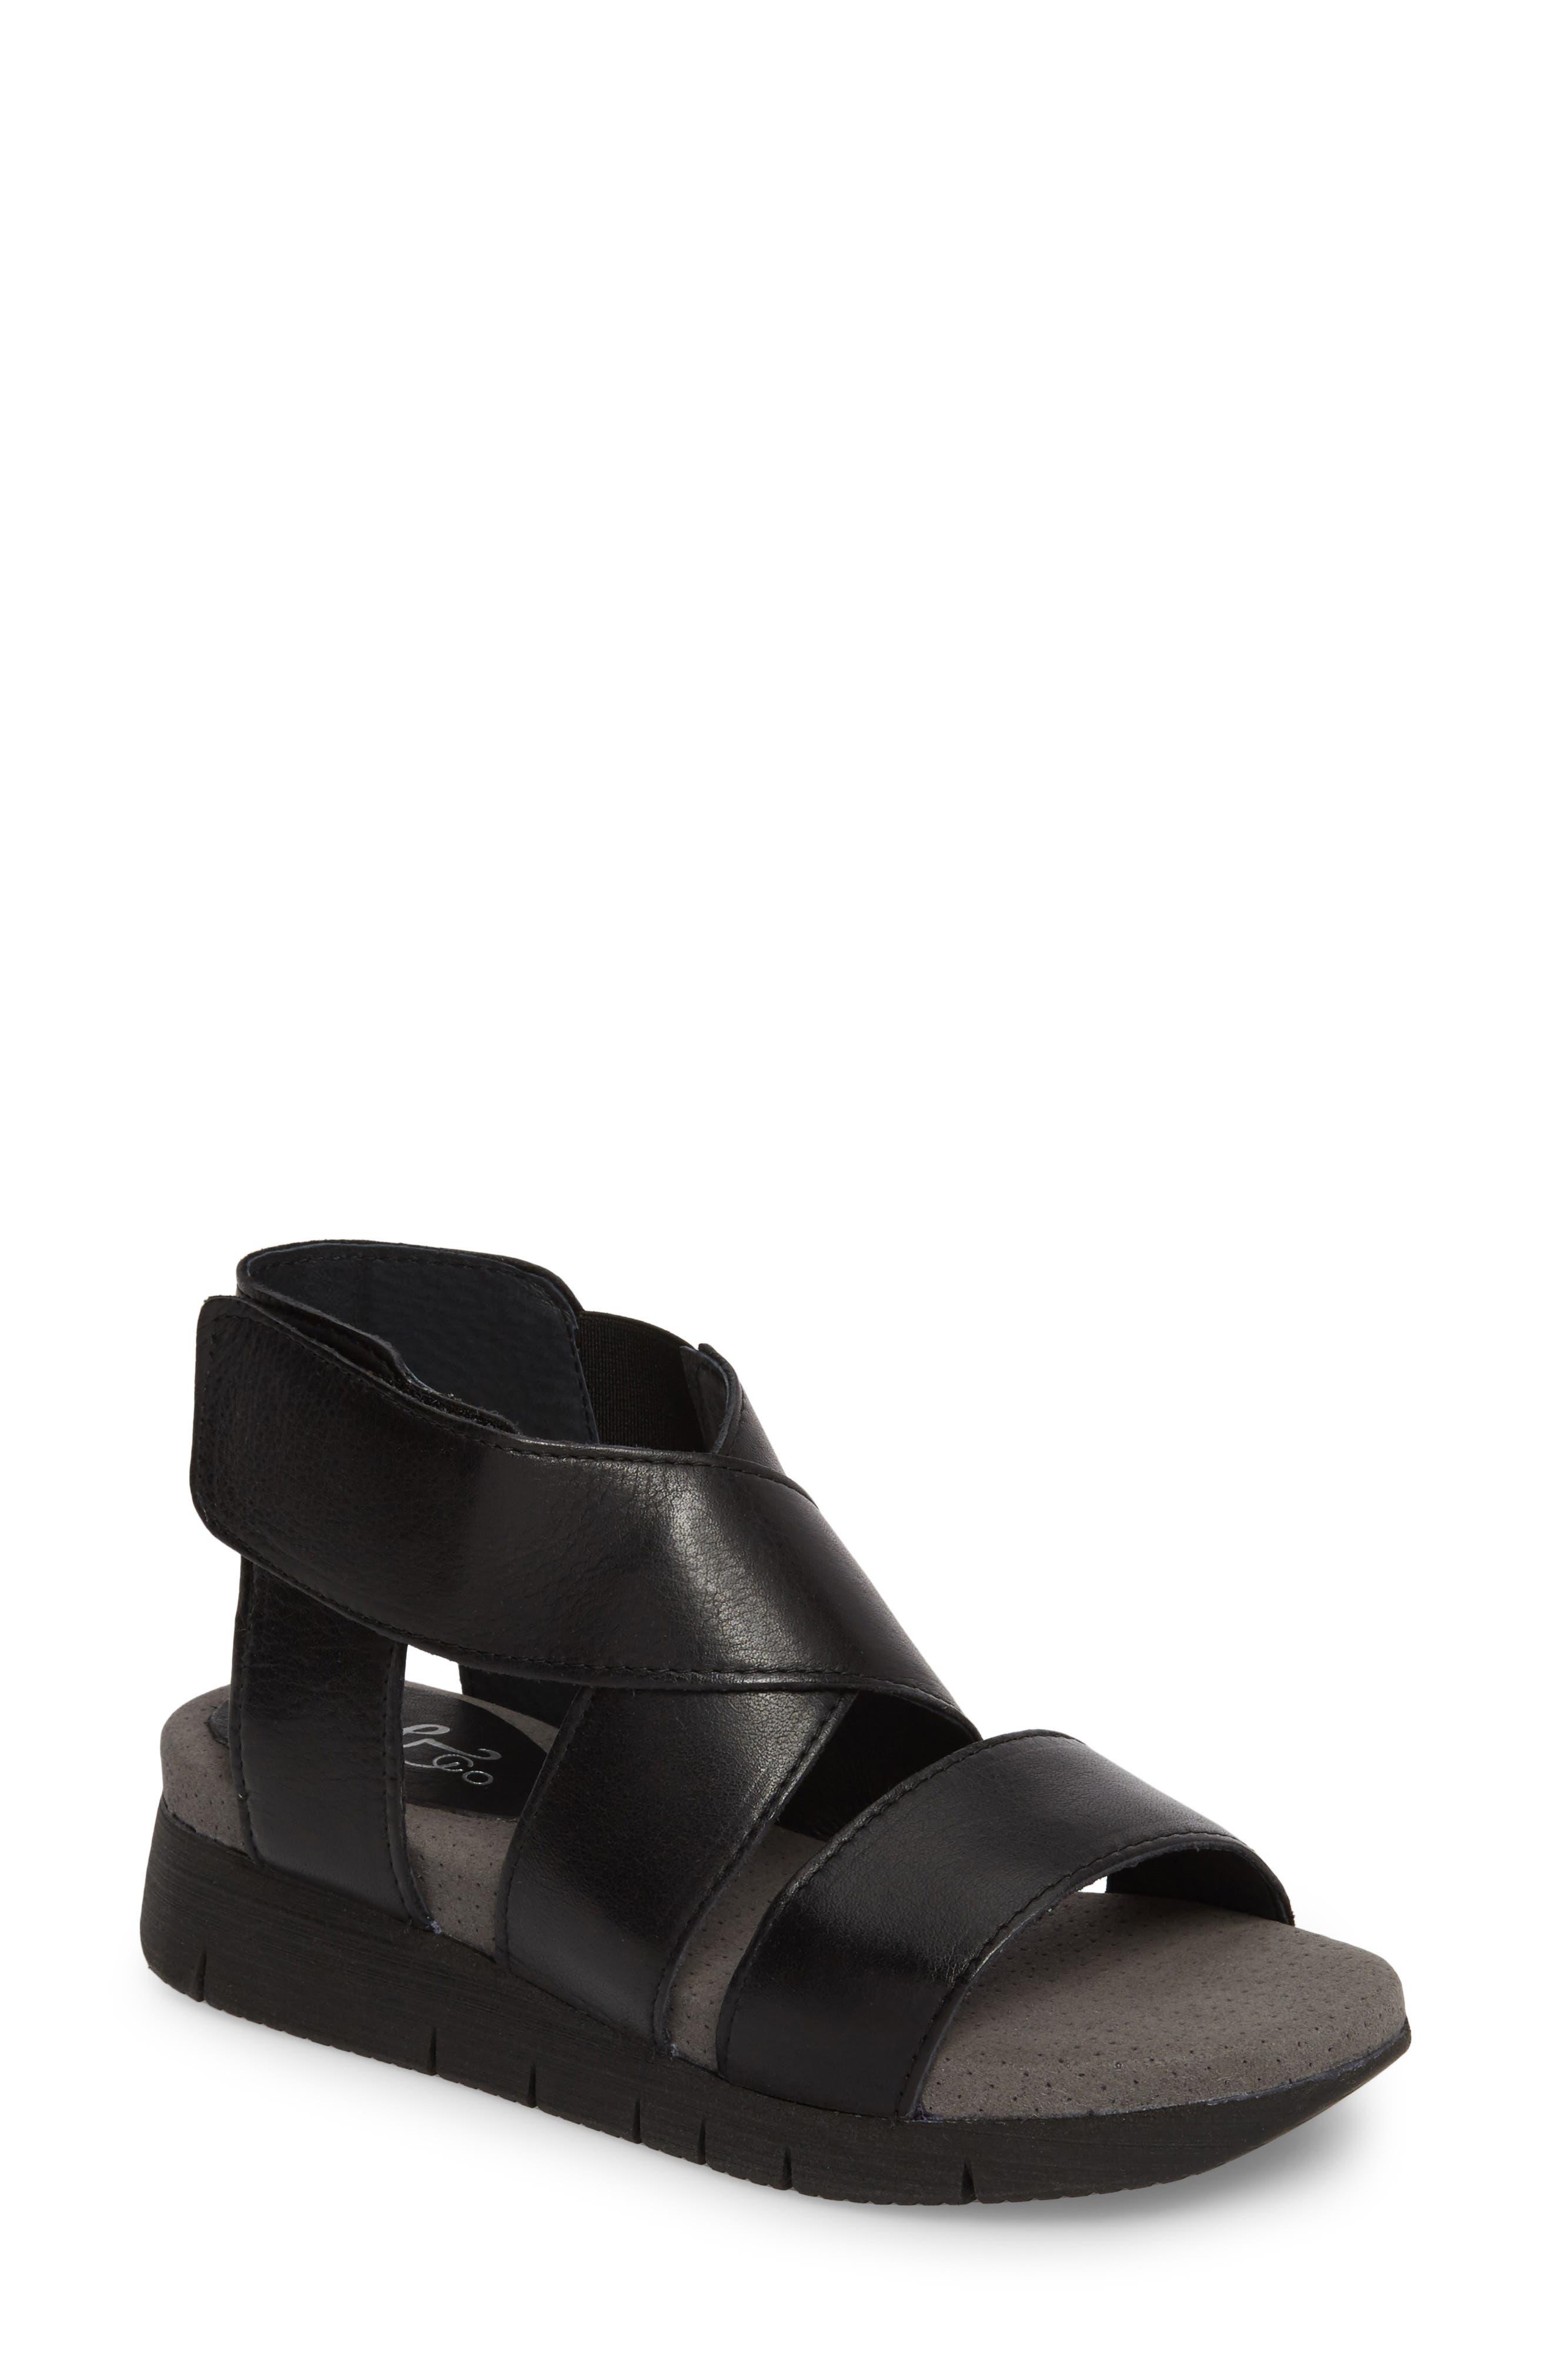 Bos. & Co. Piper Wedge Sandal - Black